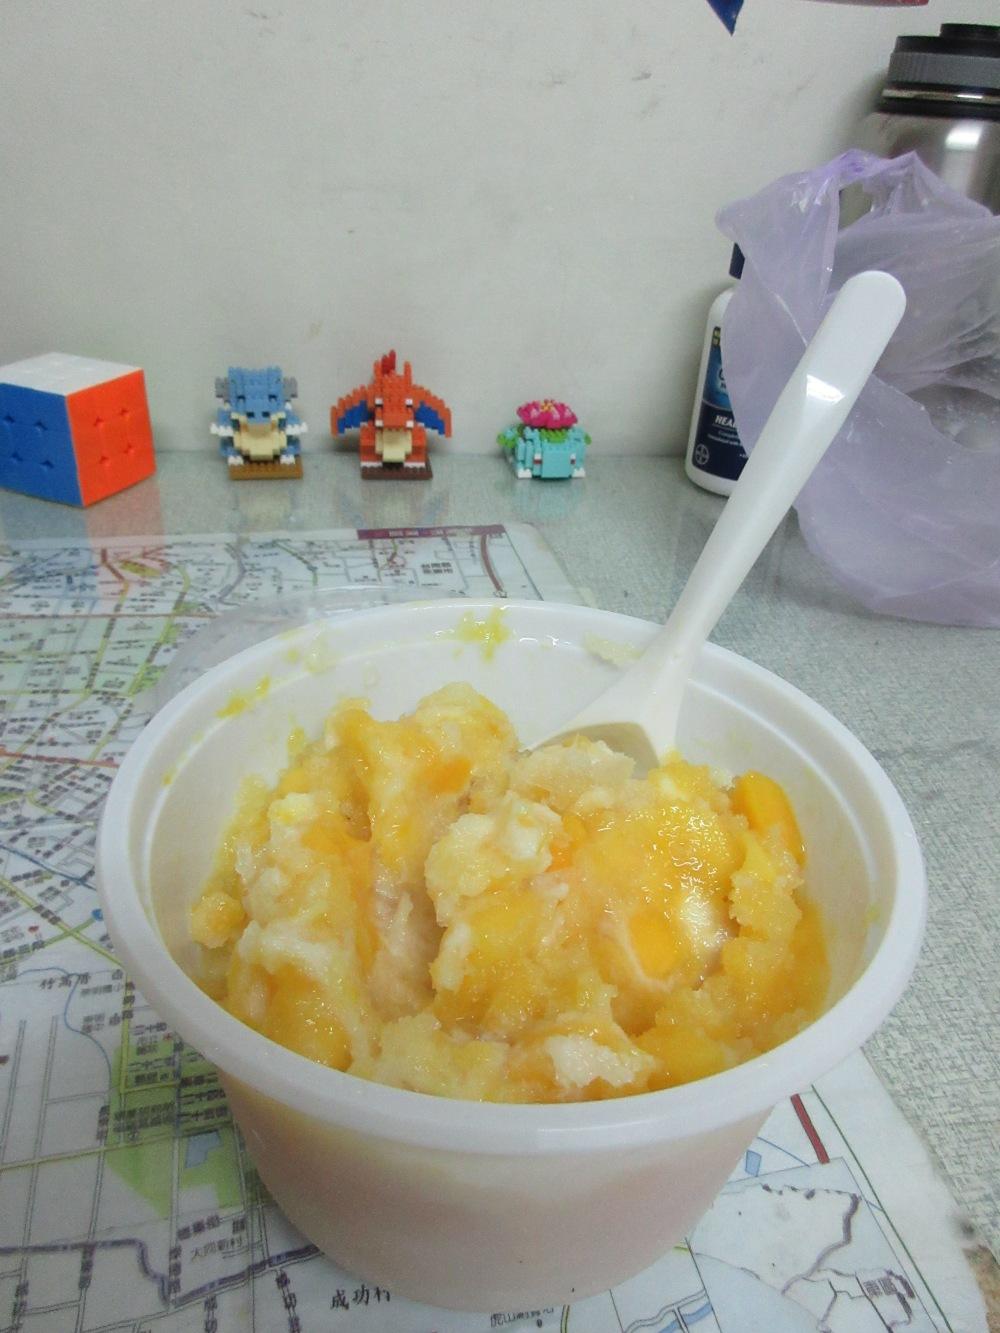 090517 mango bing